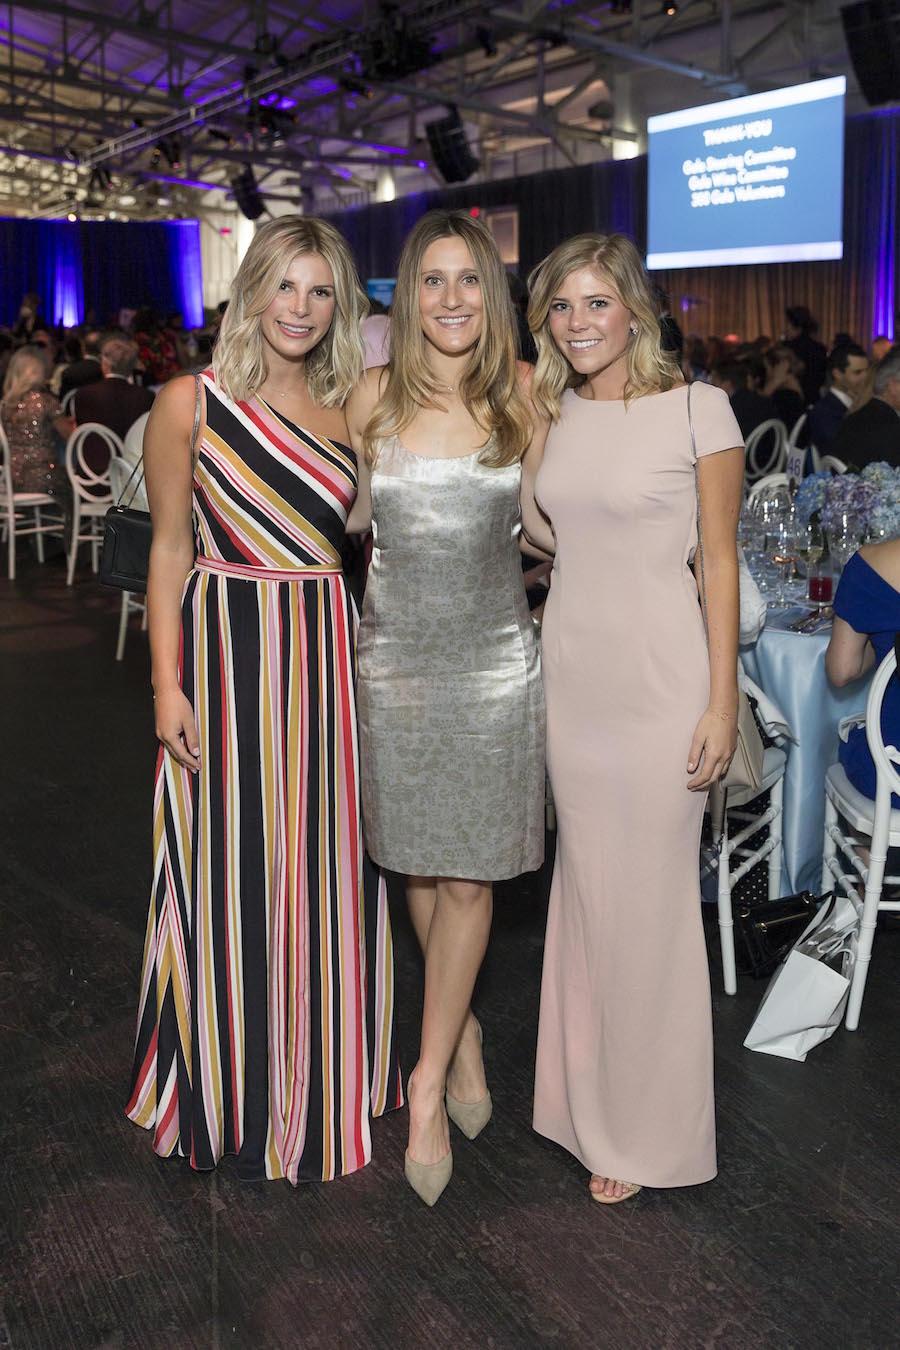 Andi Gazelle, Paige Eller and Natalie Eggers